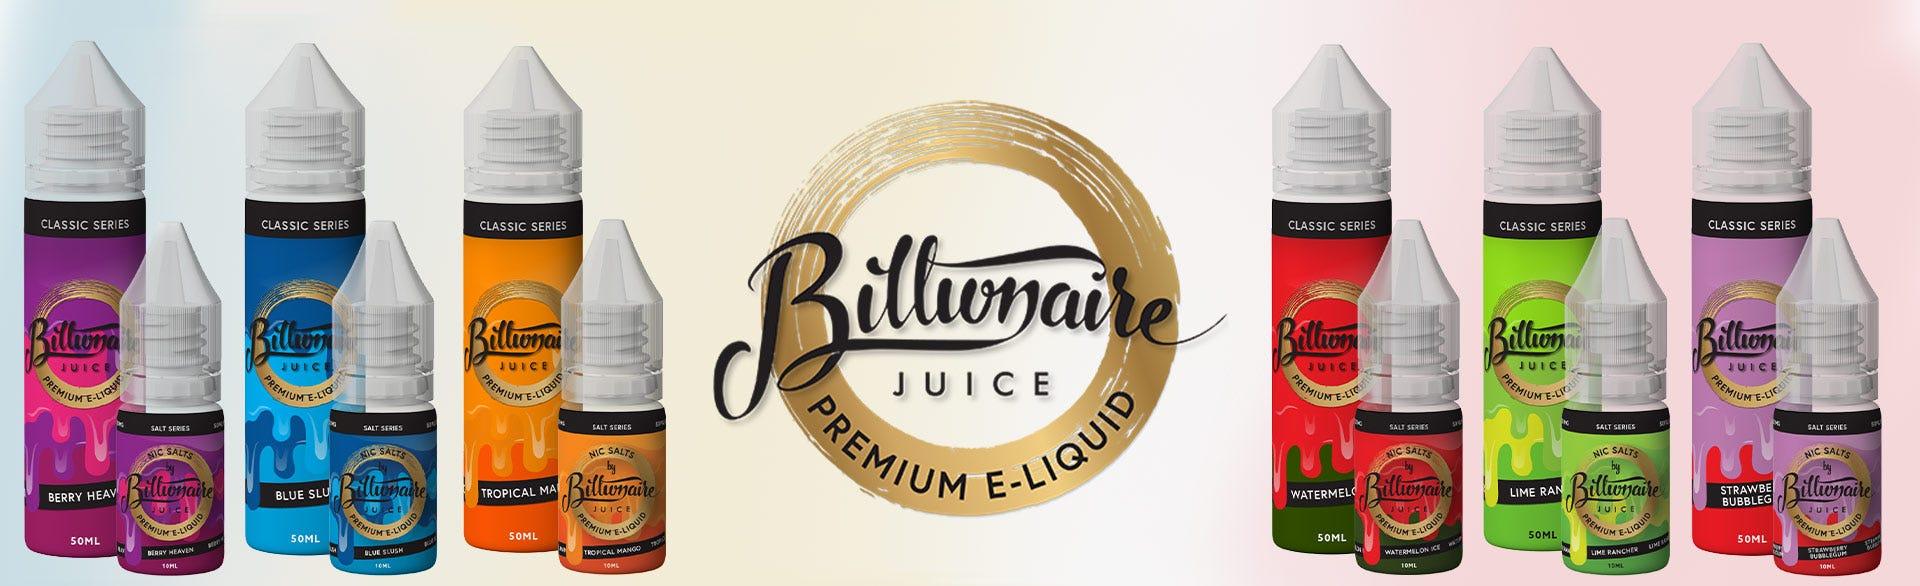 Billonaire